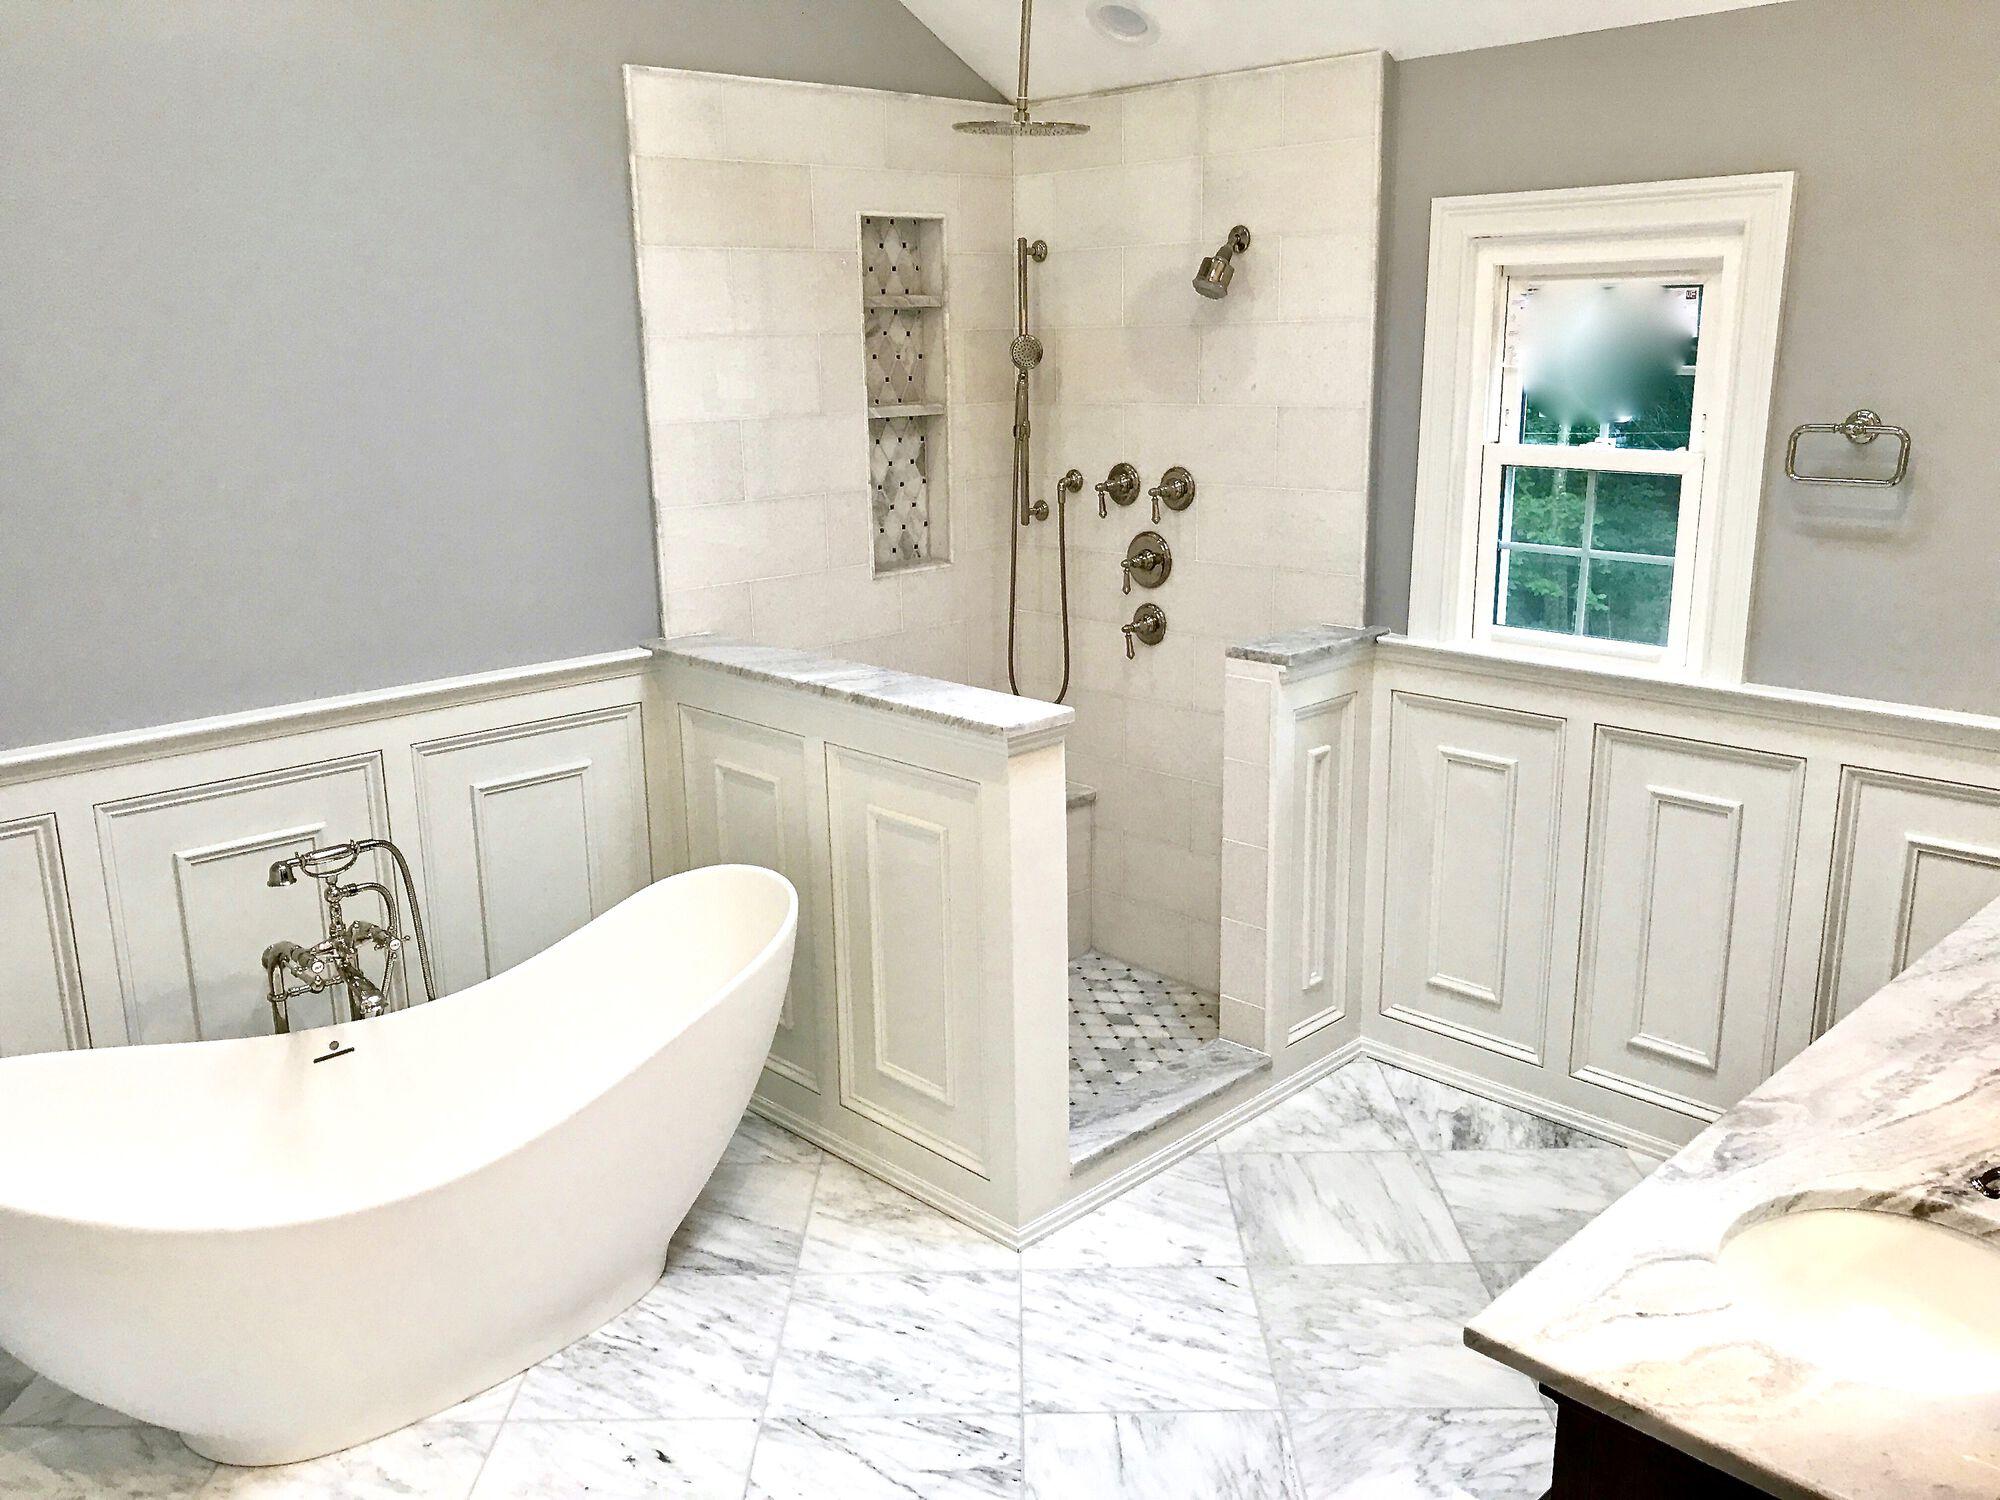 Freestanding Tub, Shower with Overhead, Marble Floor, Millwork Paneled Walls, Floor Mounted Filler in Basking Ridge, Somerset County NJ